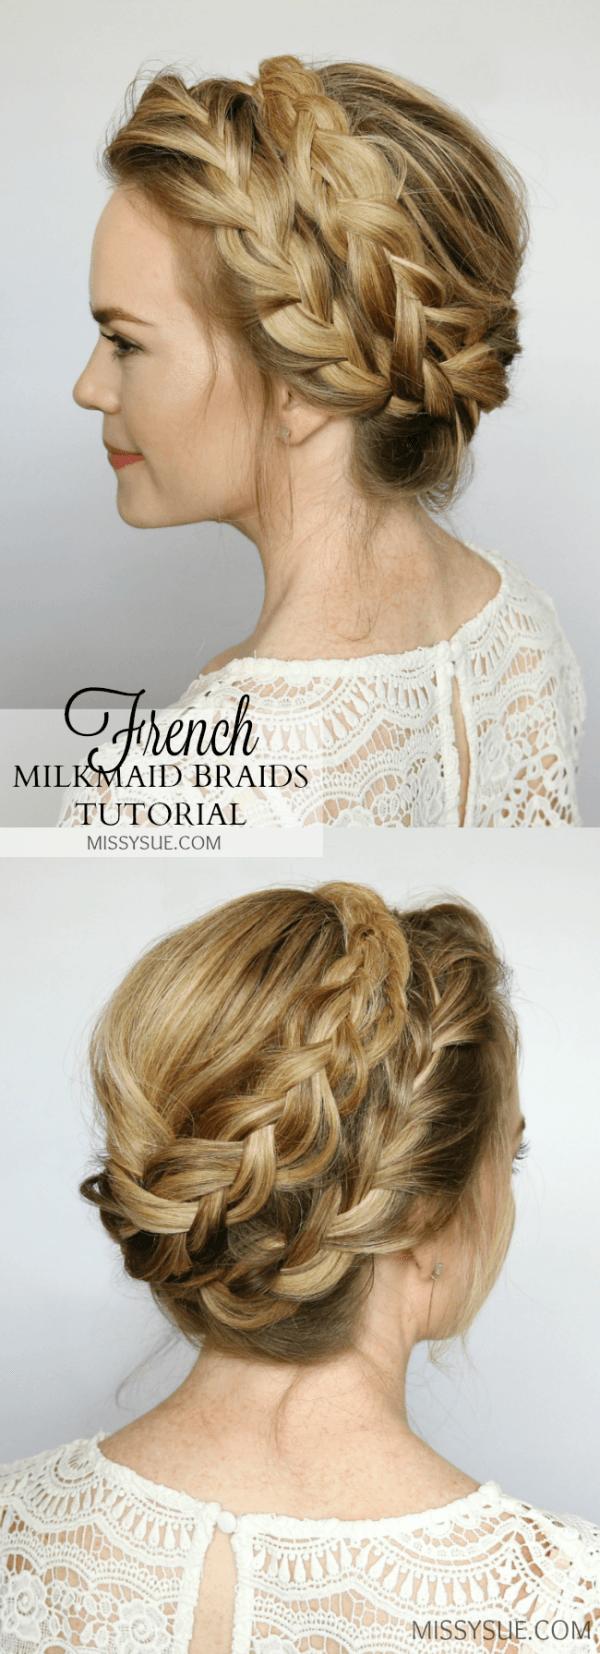 french milkmaid braids braided